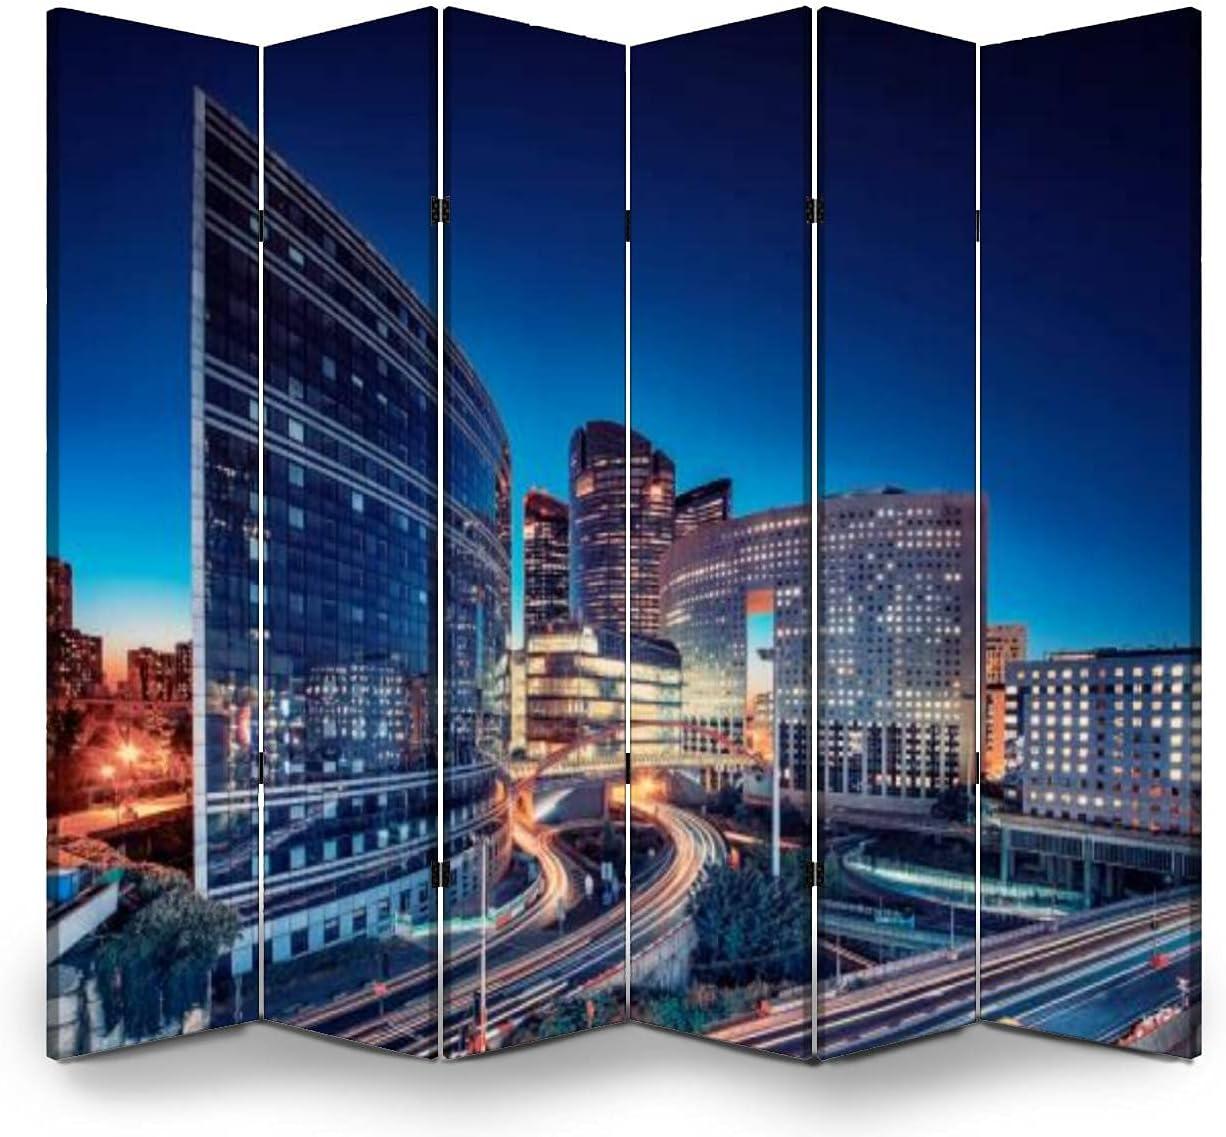 Dola-Dola 6 Panel Screen Room Philadelphia Mall Divider Paris Building in F Modern Ranking TOP19